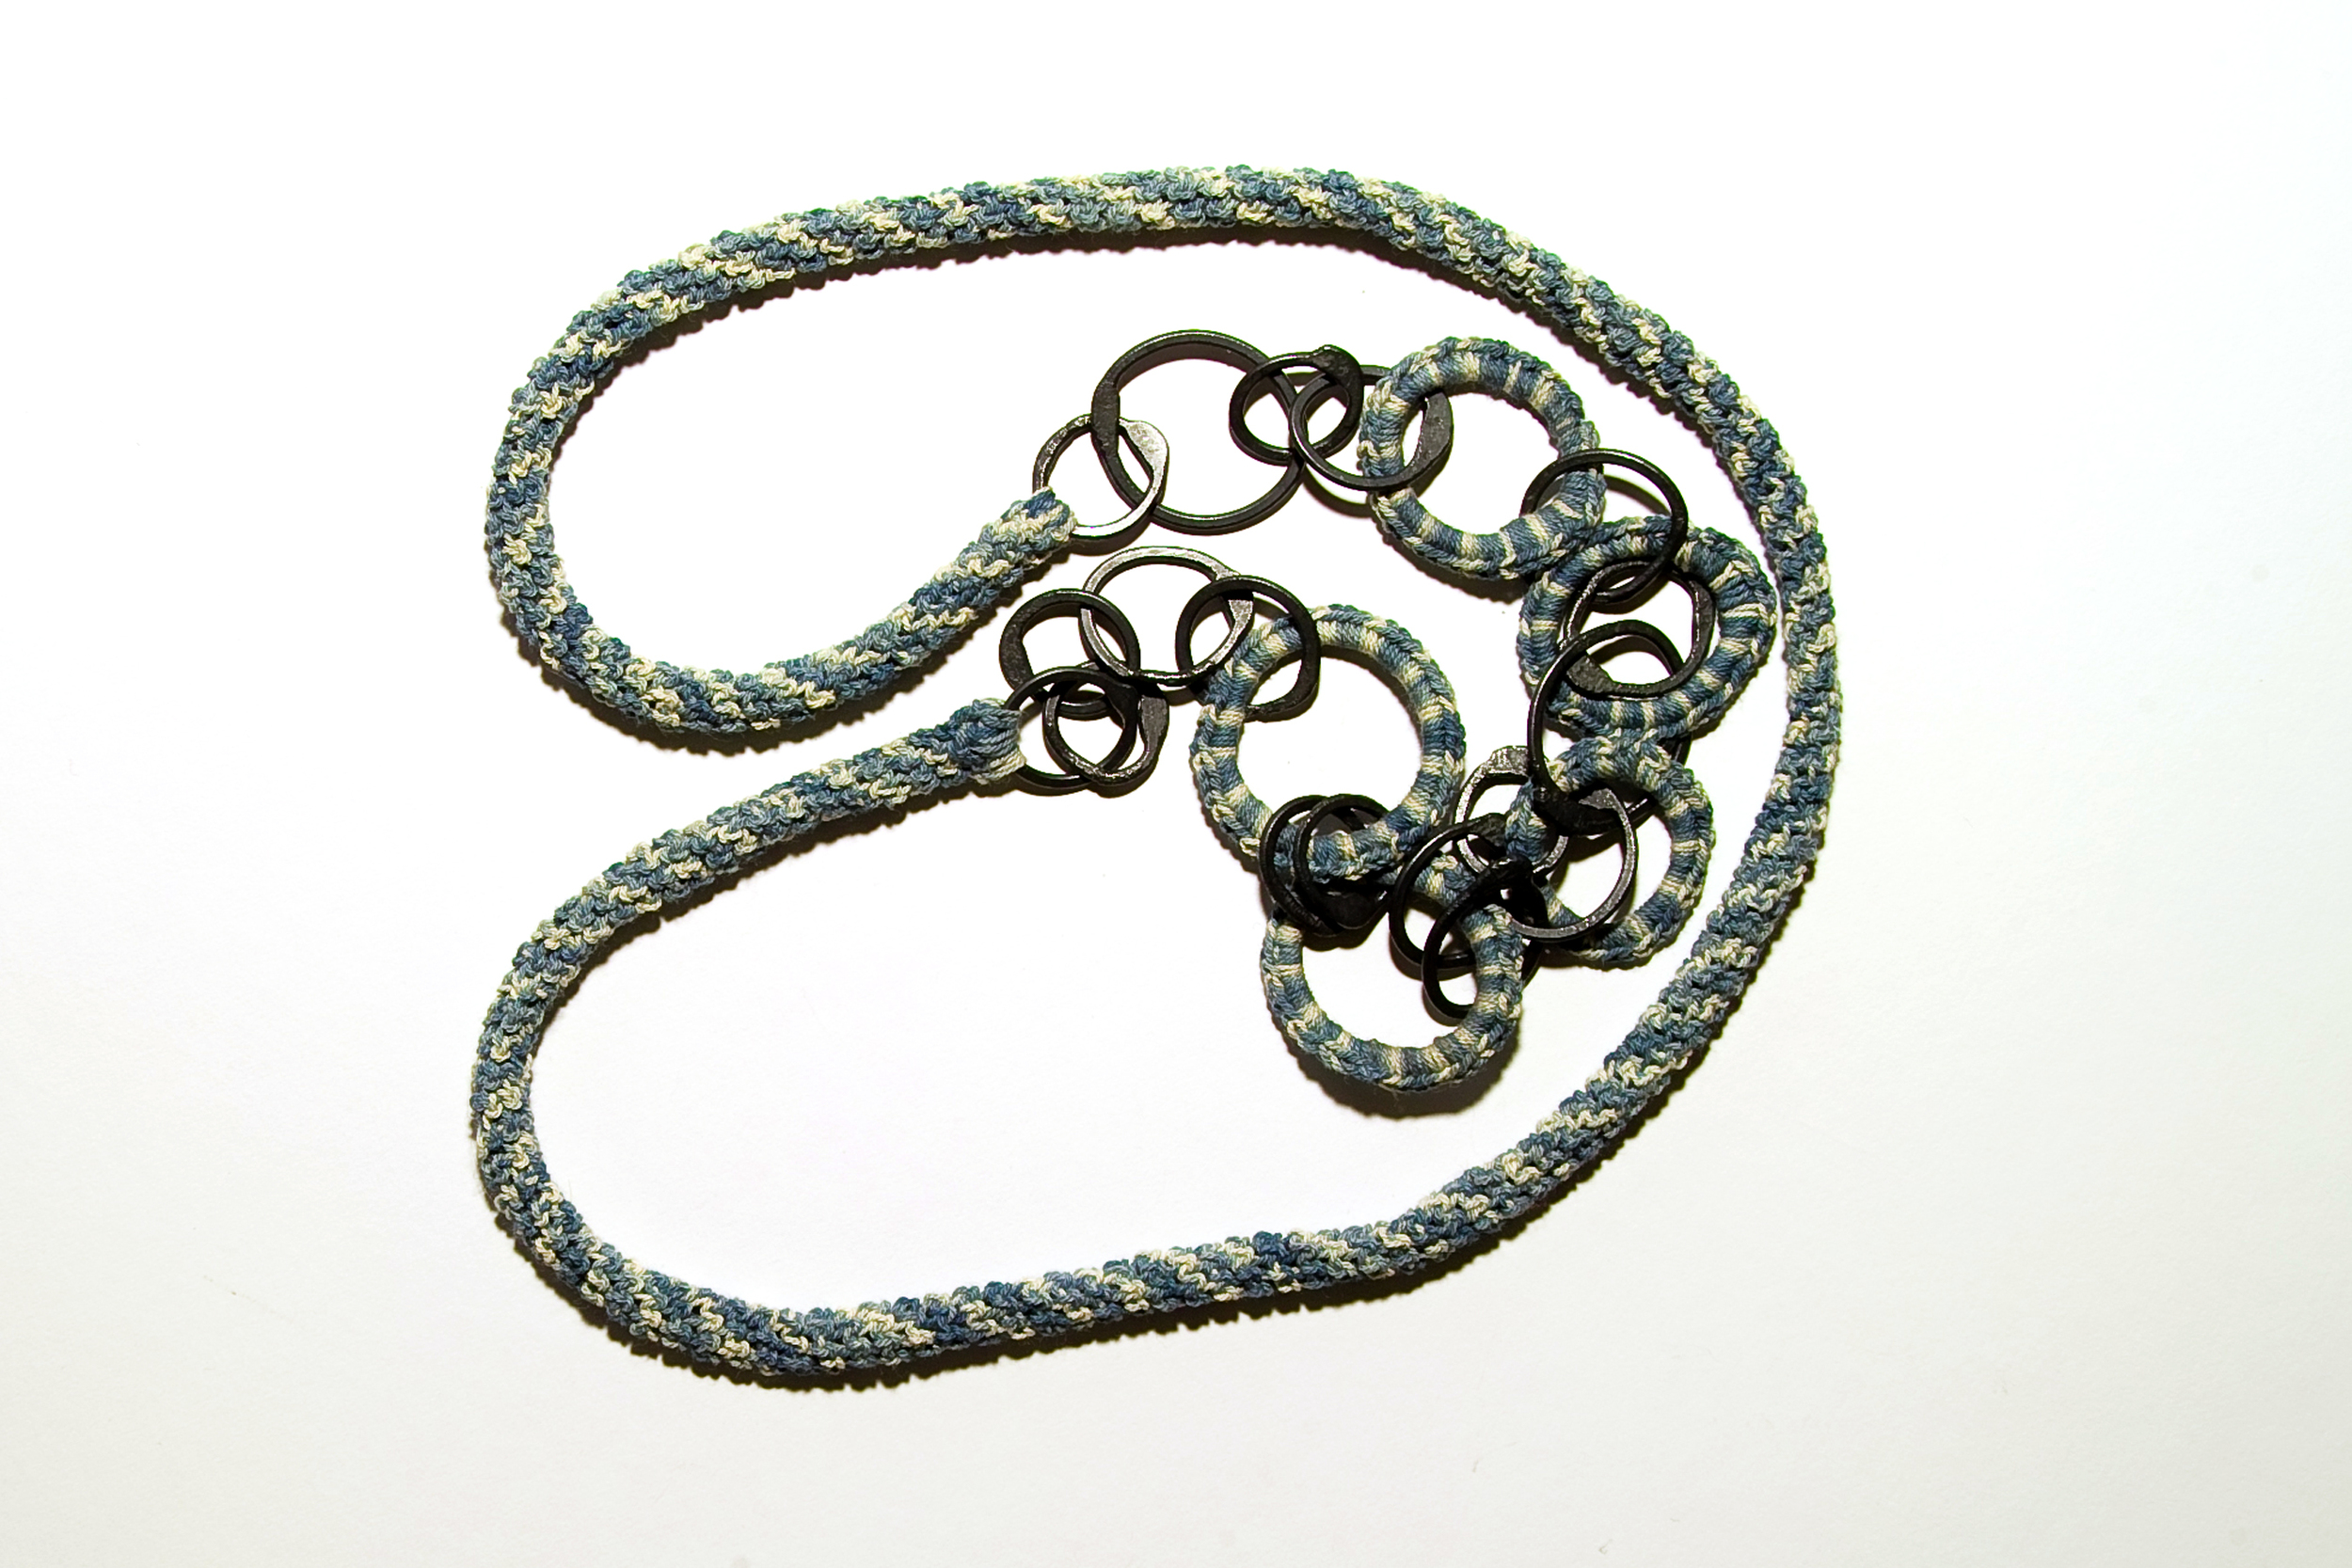 Roman Chain